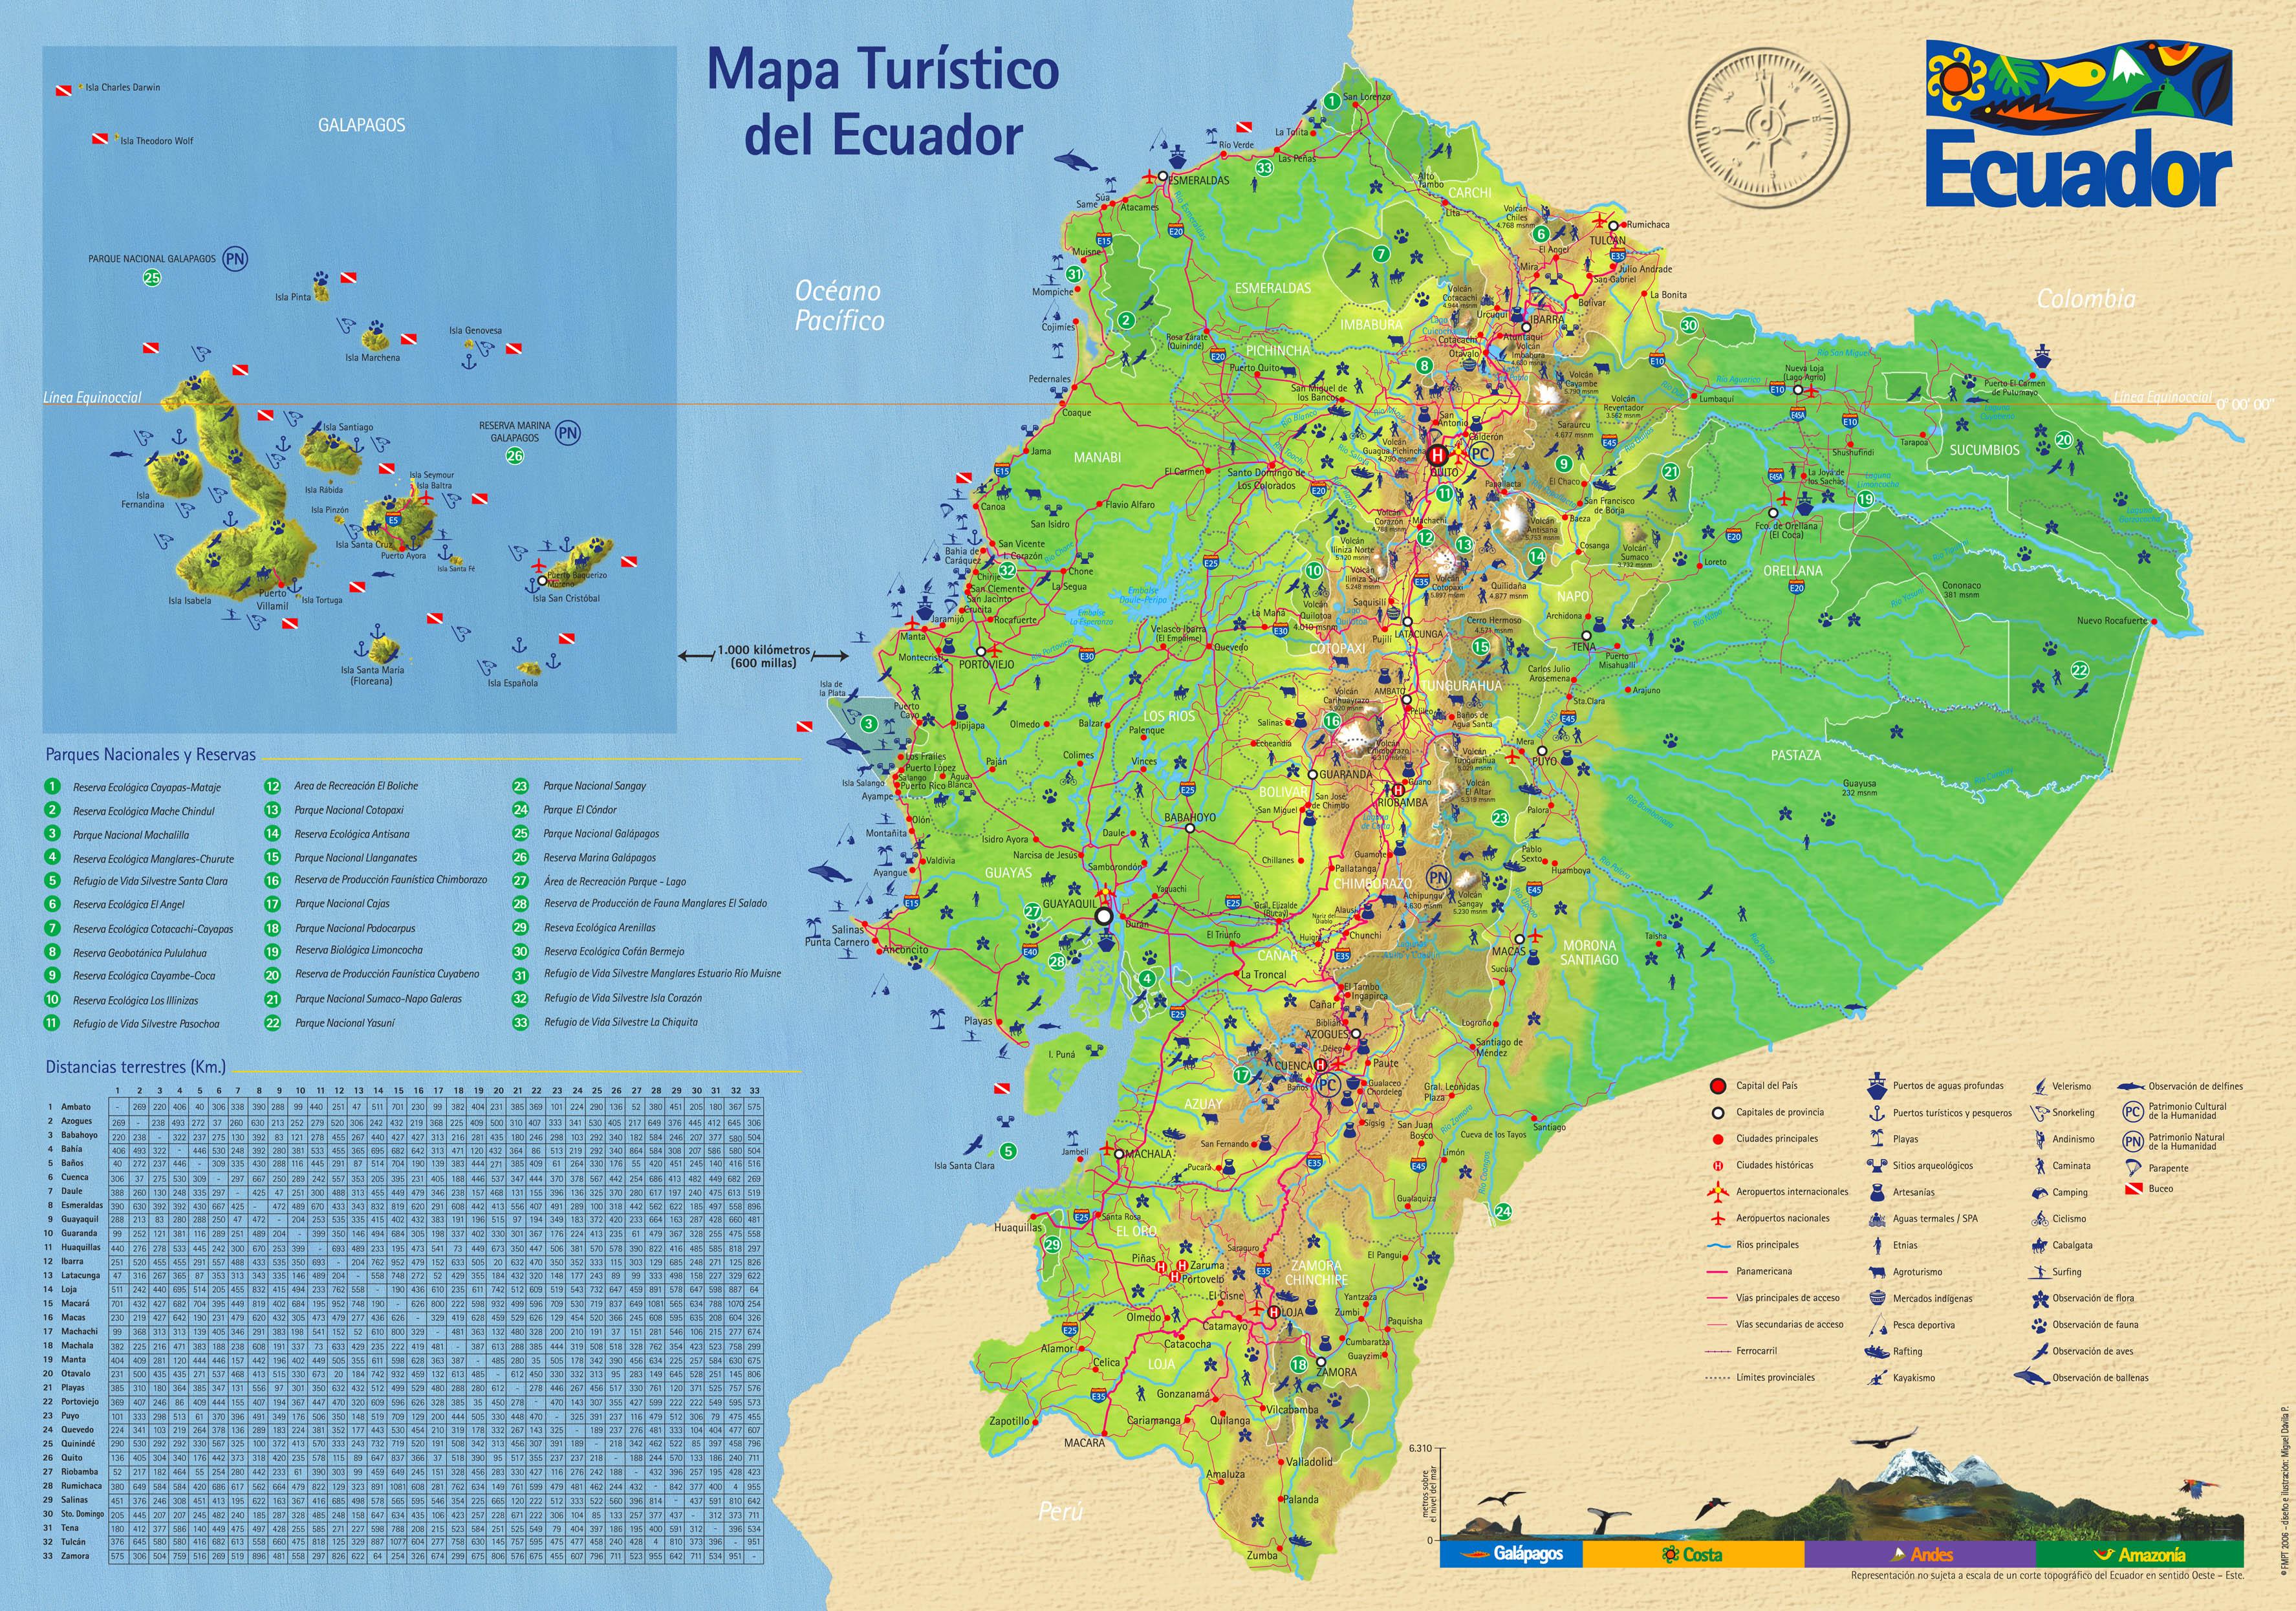 Ecuador Tourist Map Ecuador Mappery - Ecuador map